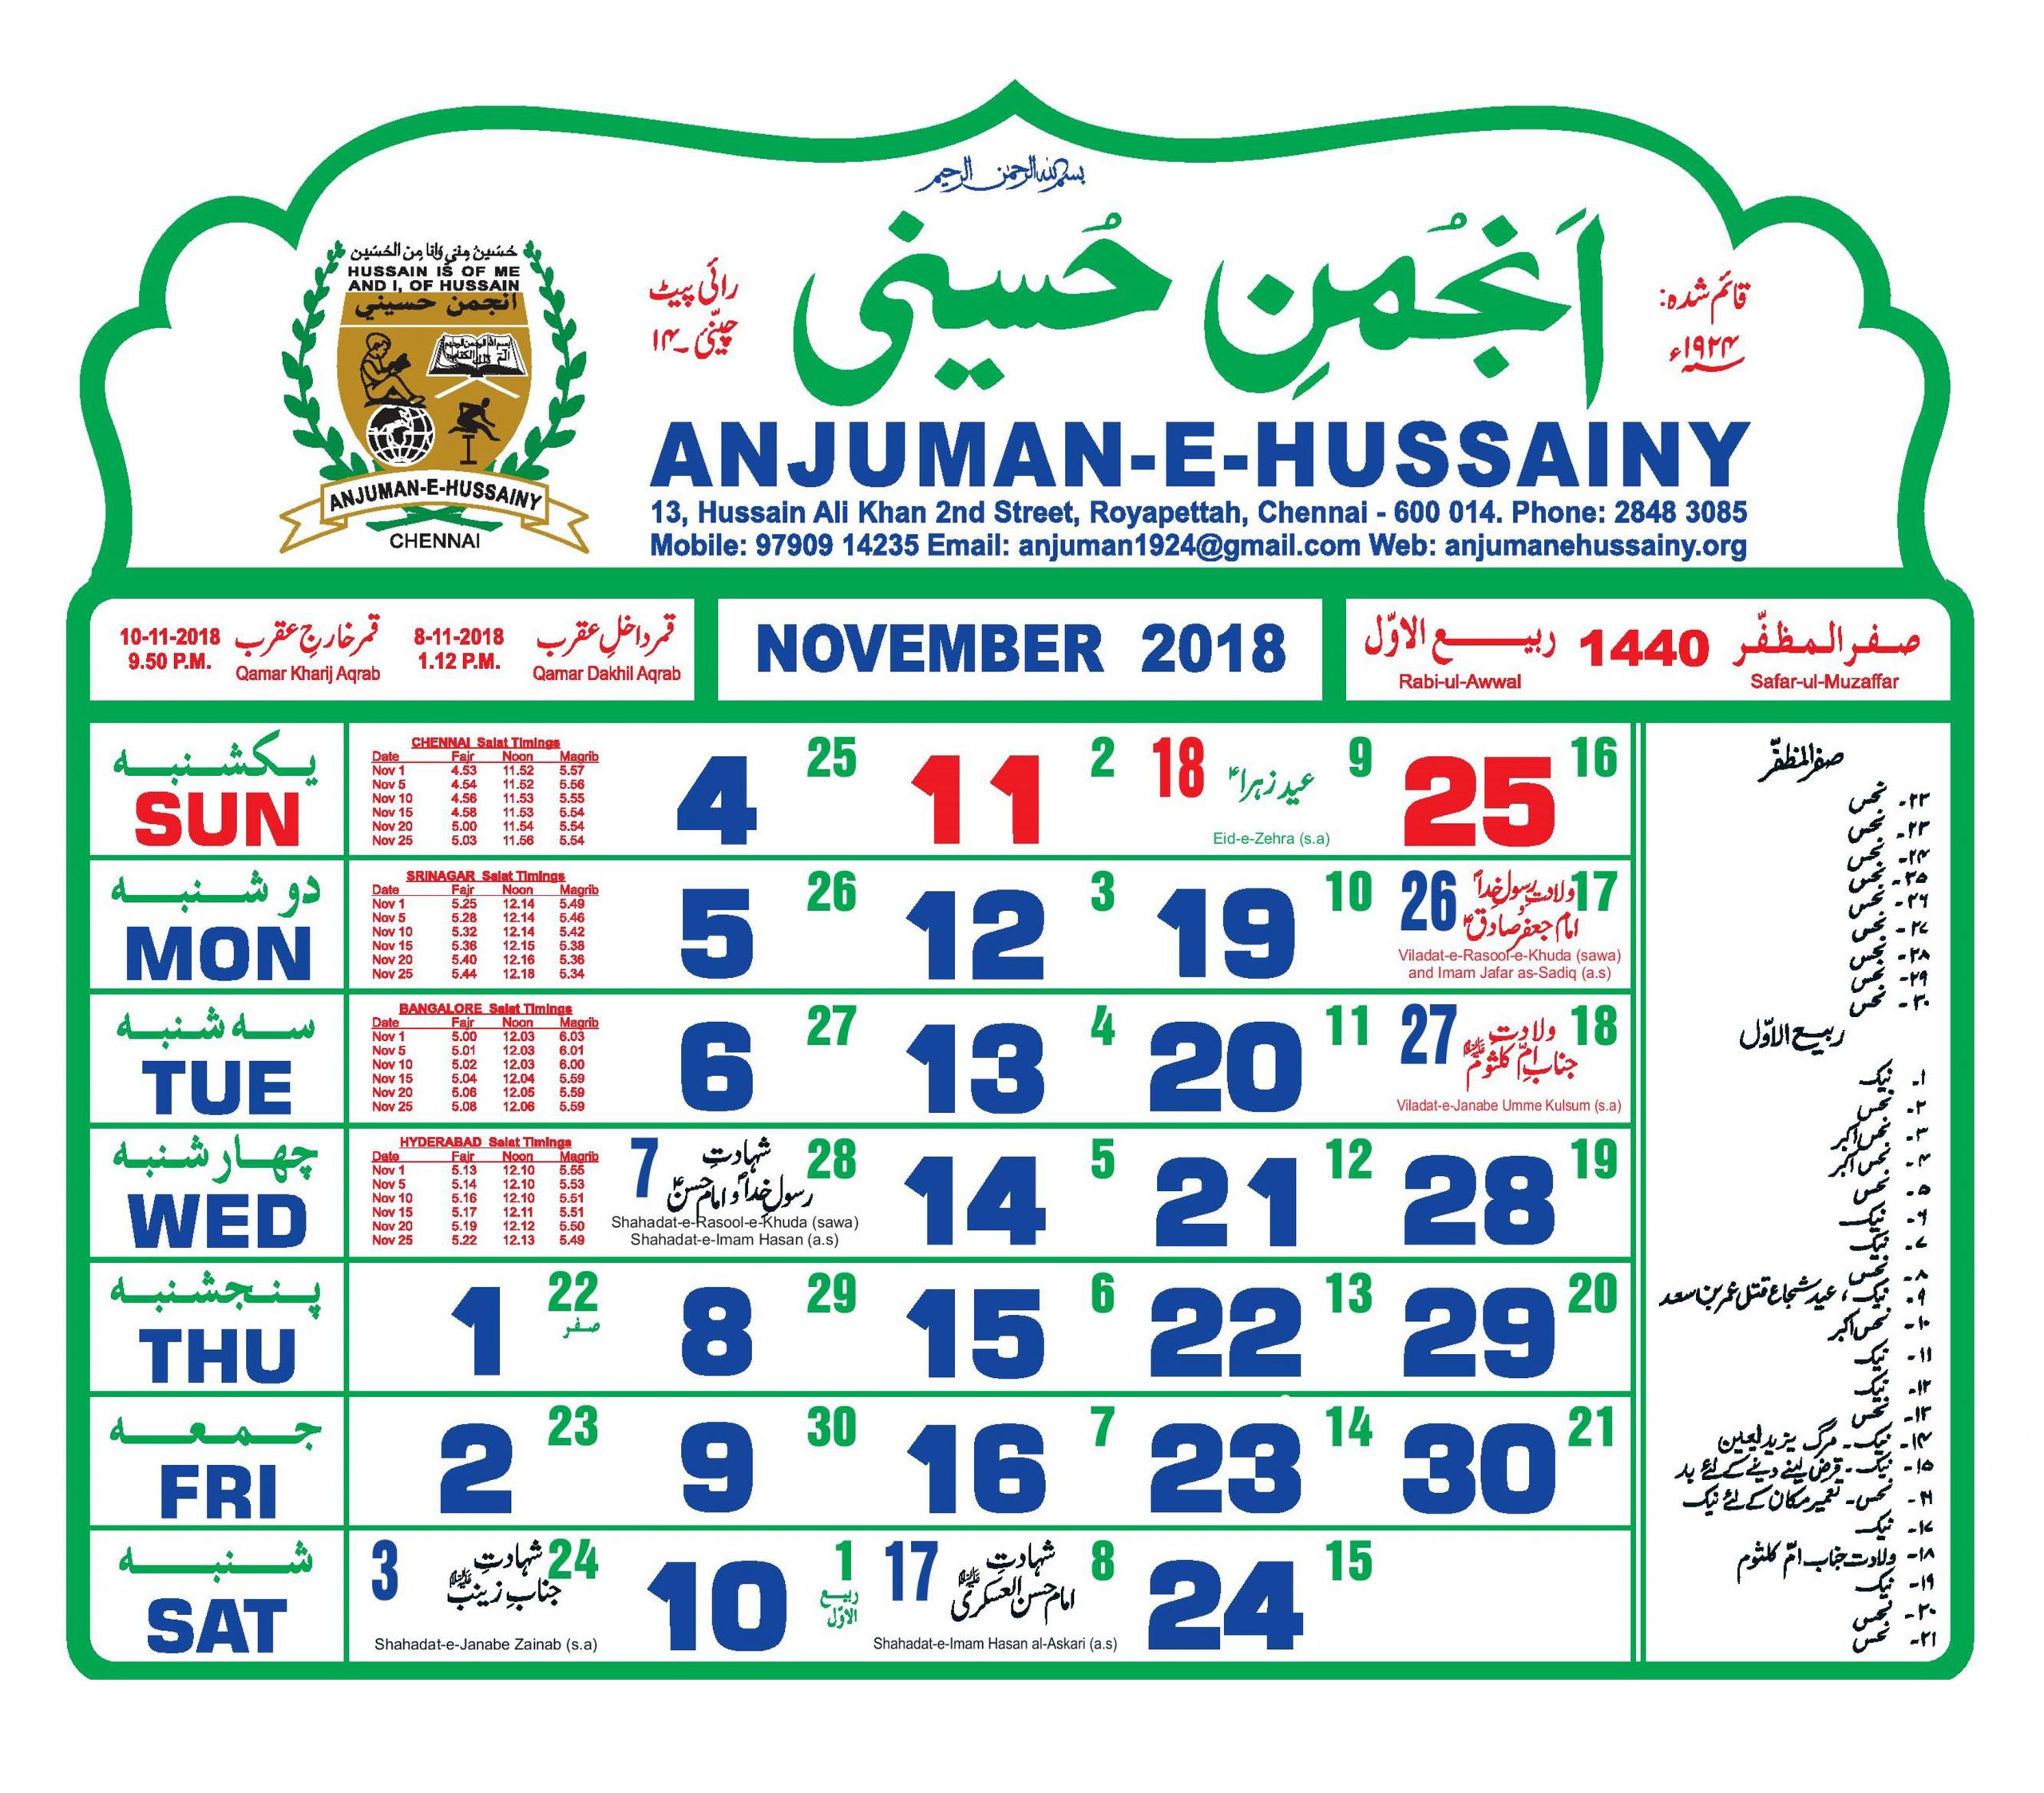 Yaad E Hussain — Ya Imam Hussain - Yaad E Hussain